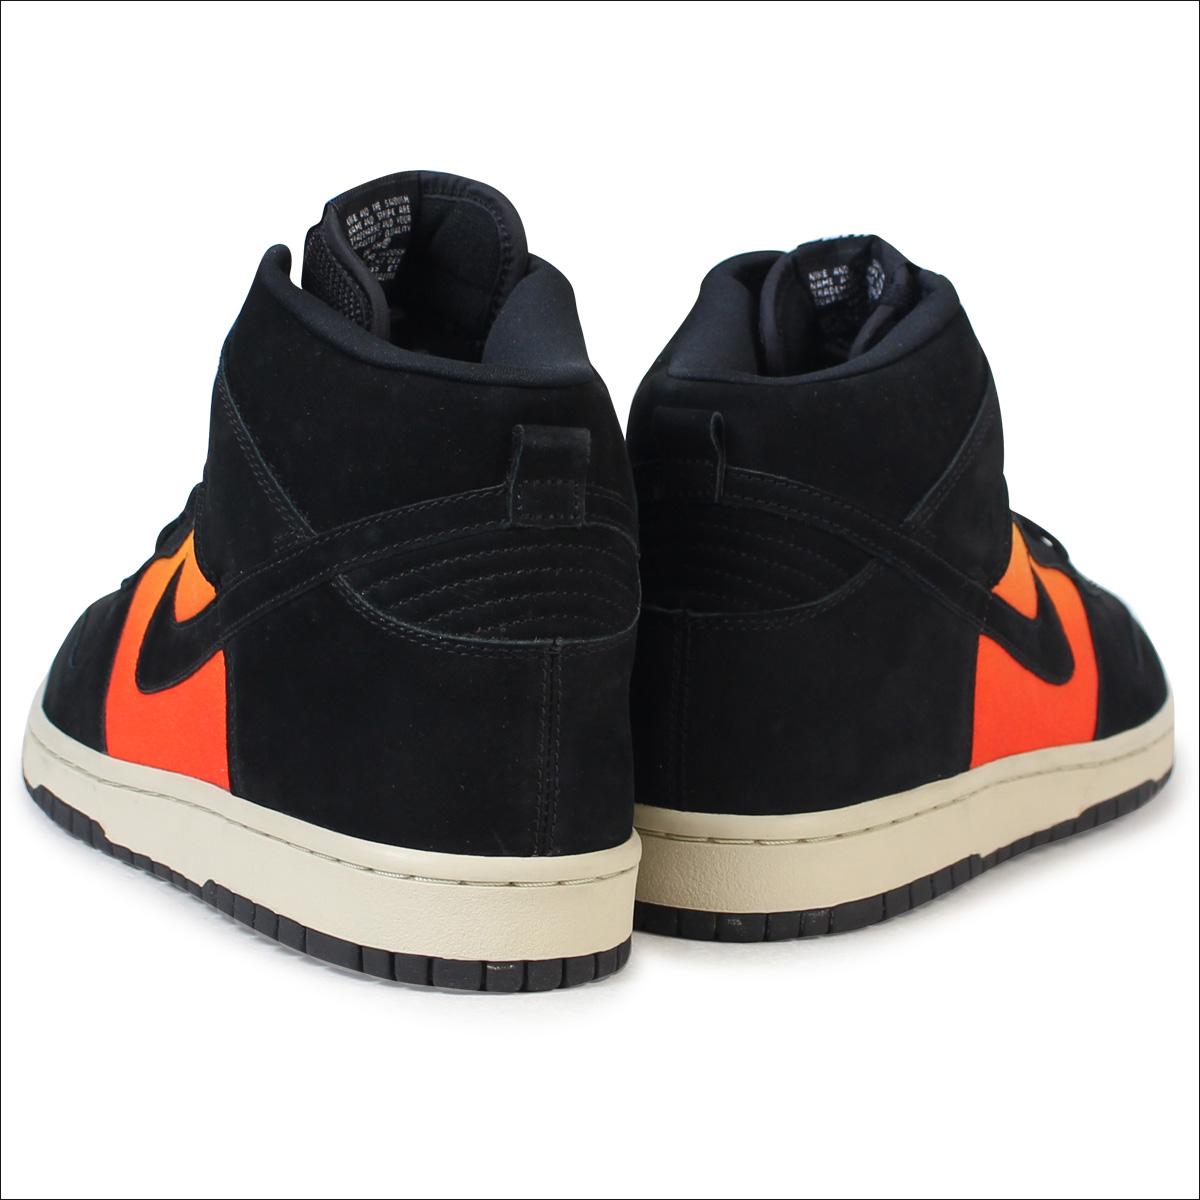 save off 63ea2 b911d Nike NIKE dunk high sneakers DUNK HIGH PREMIUM SUNSET 306,968-001 mens  shoes black